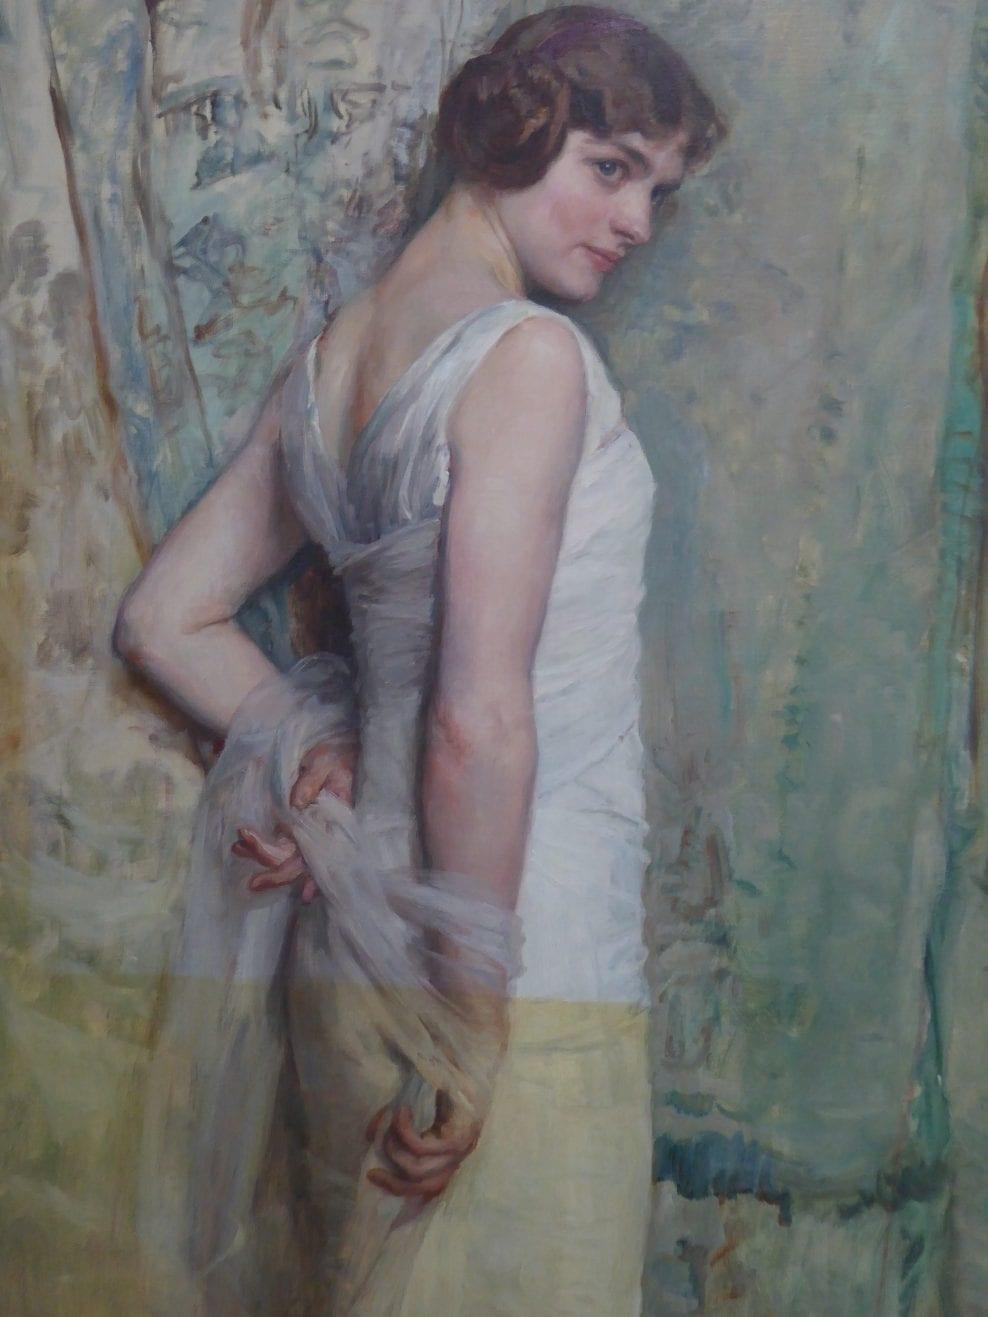 'Jeunesse' by Herman Richir (1866-1942)